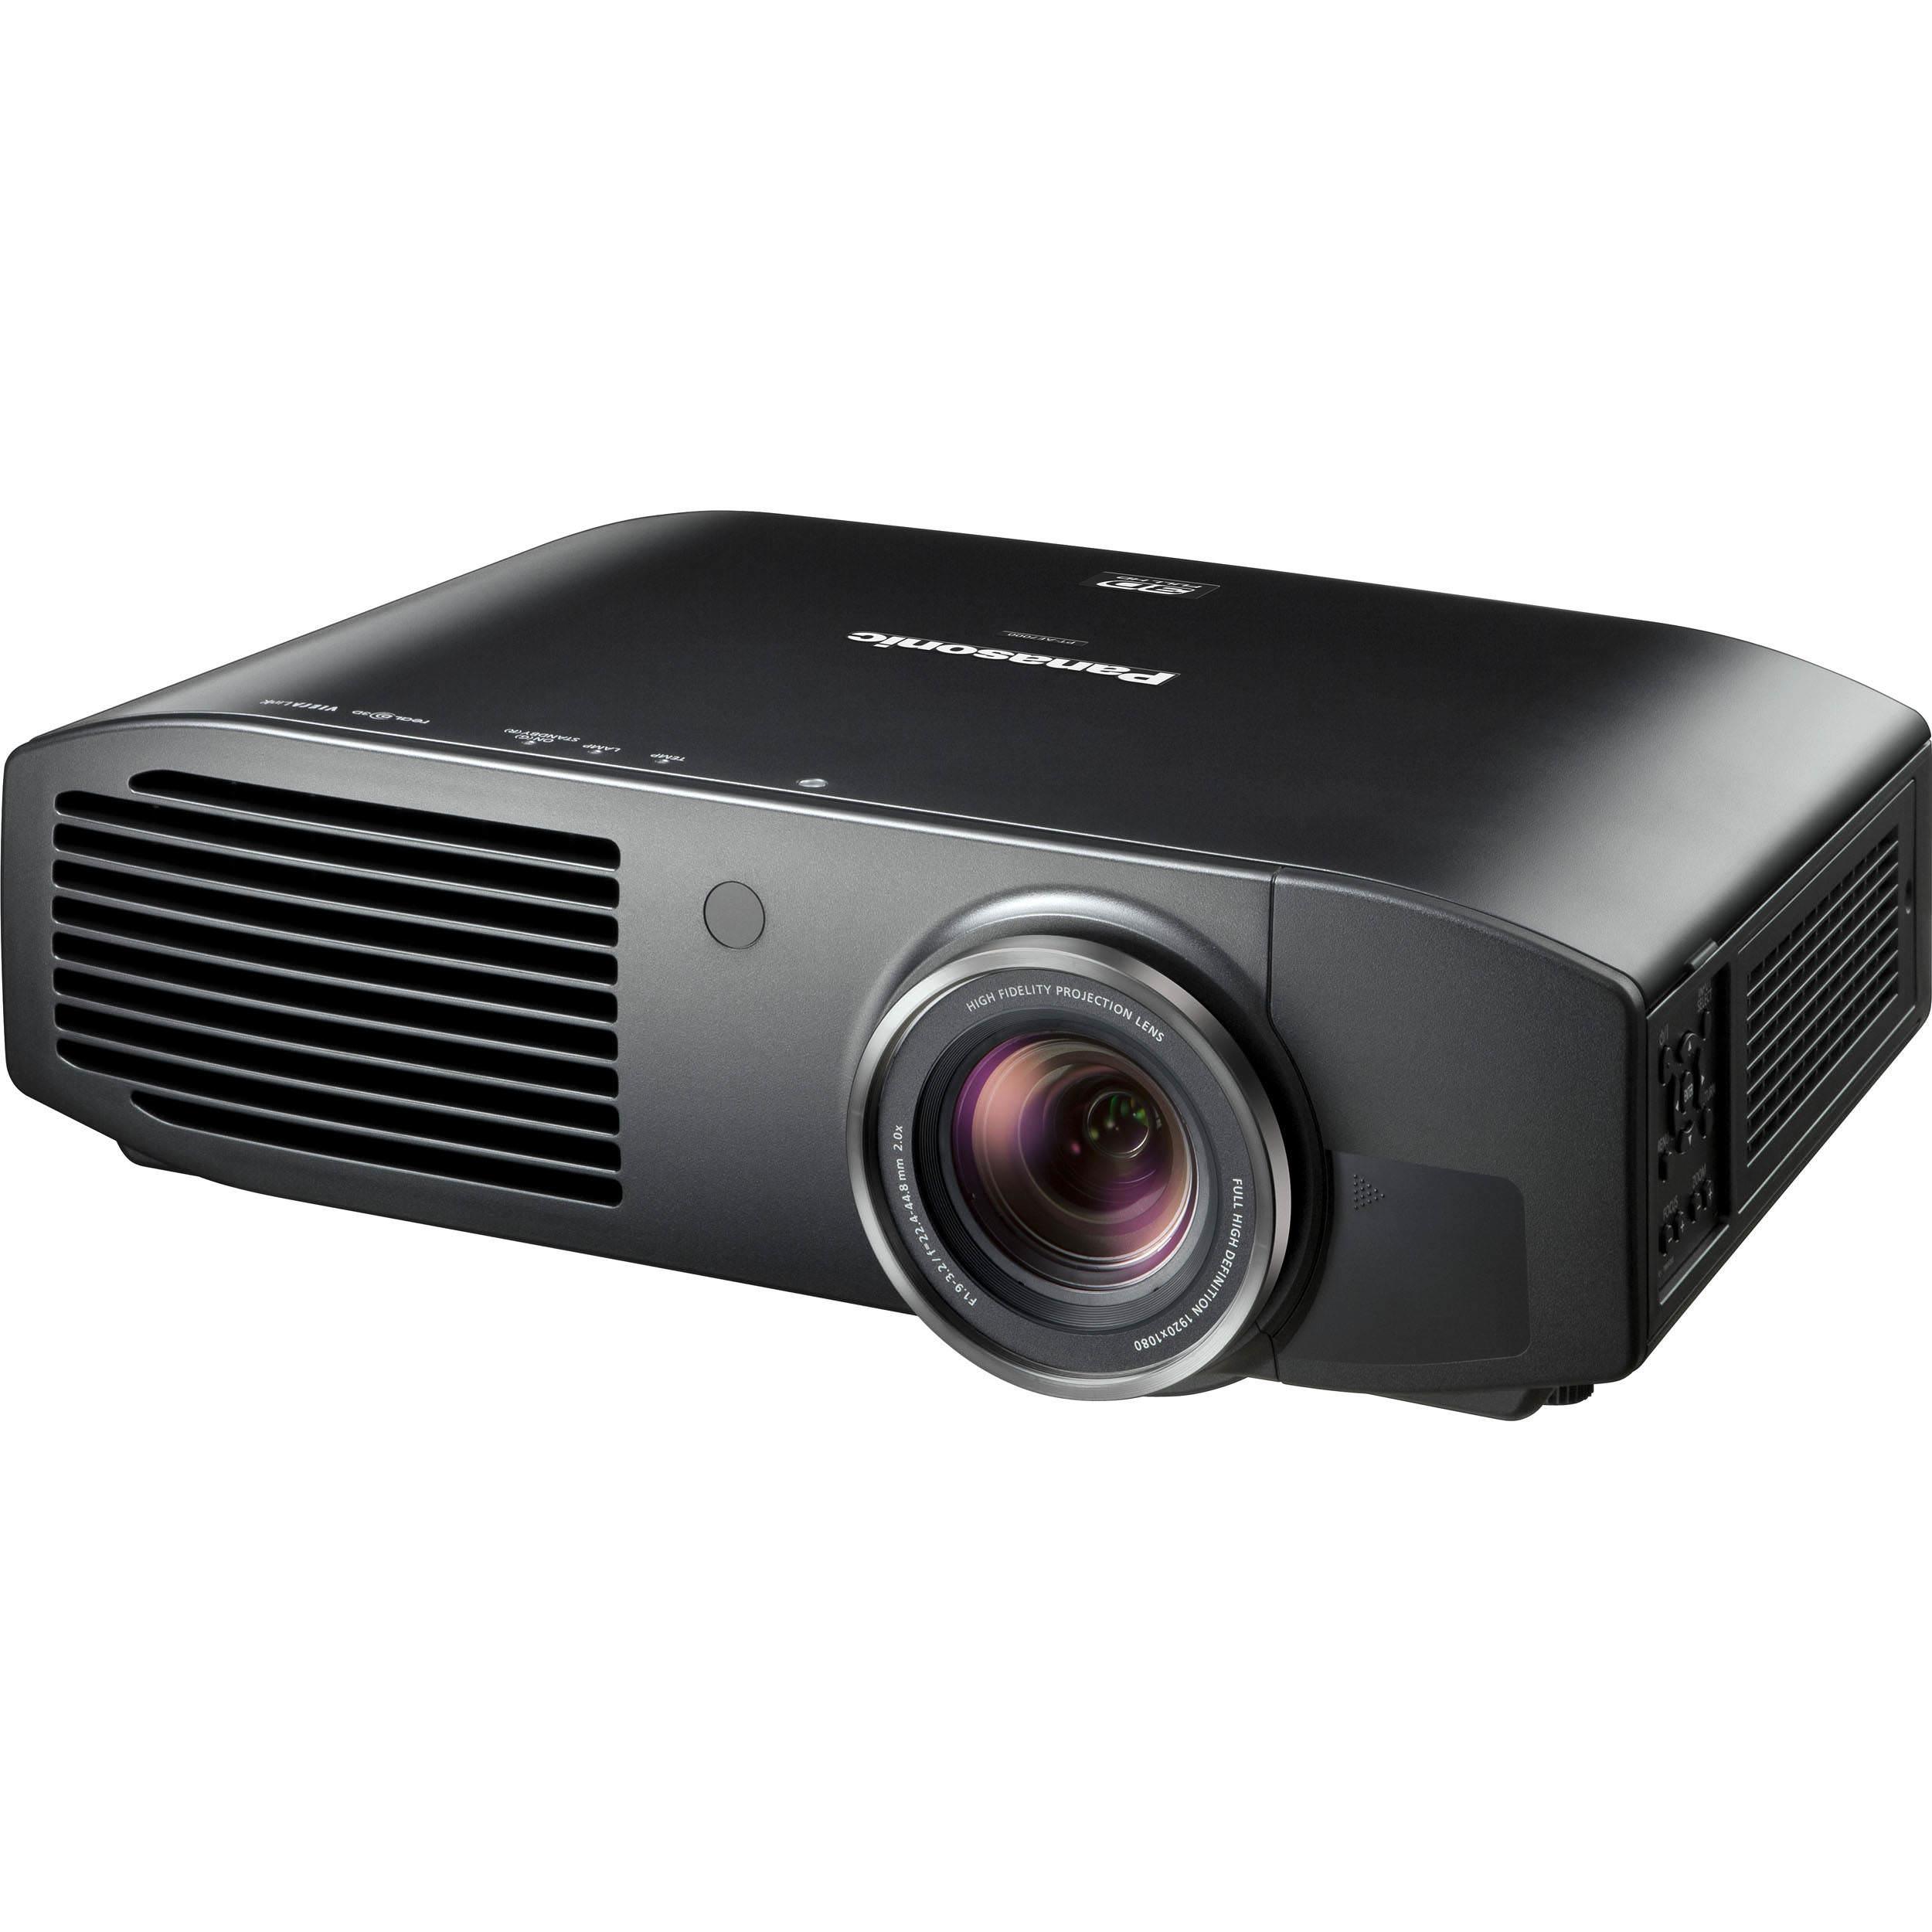 Panasonic PT-AE7000U 3D Full HD Projector